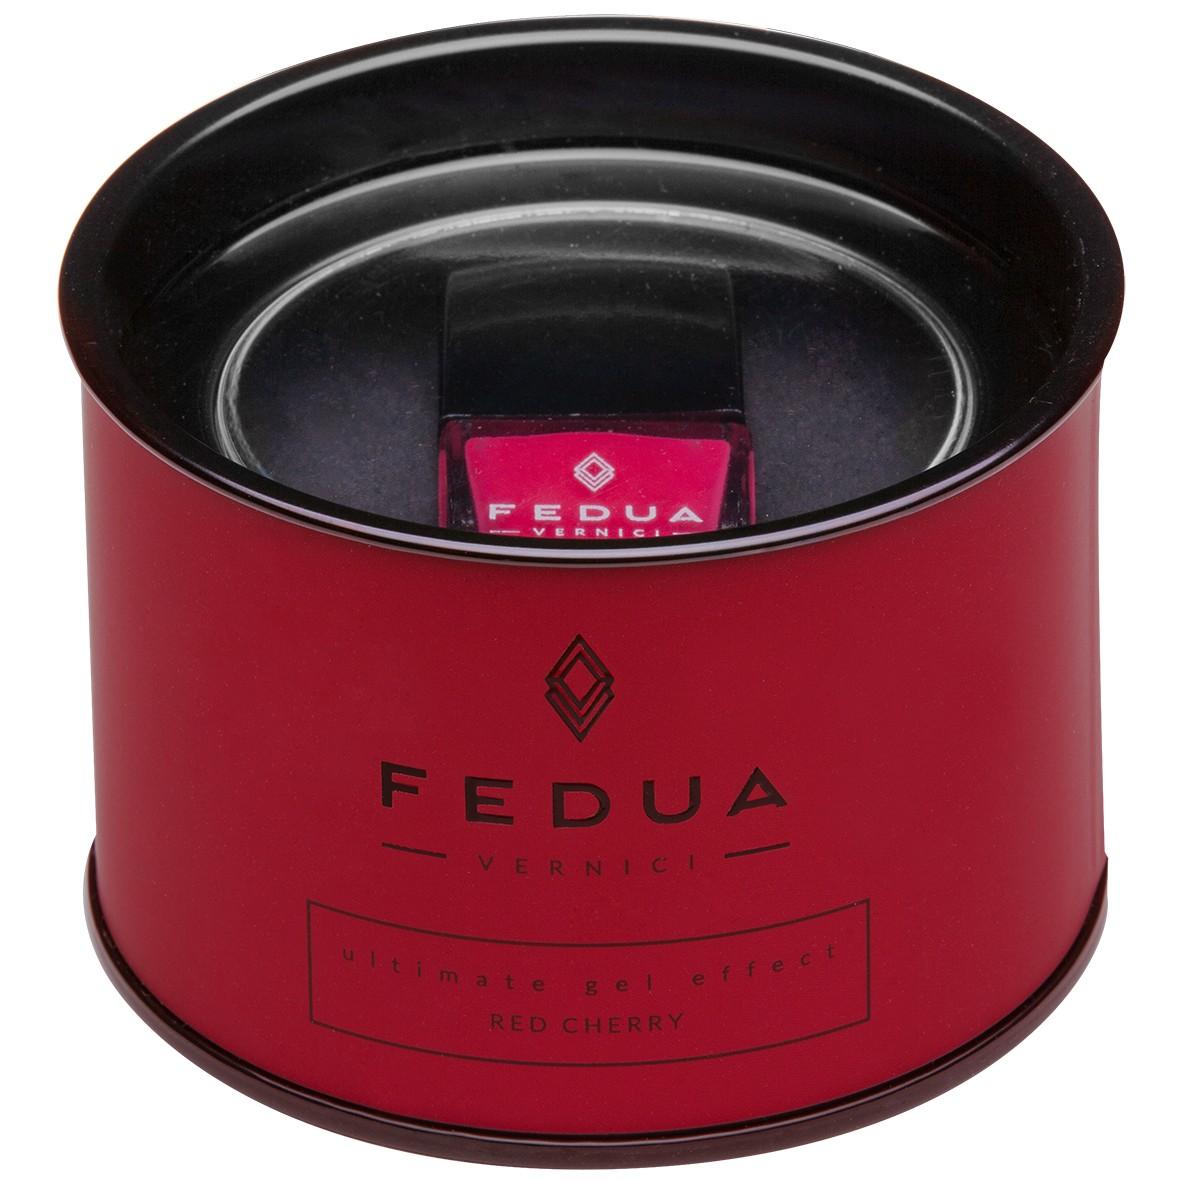 Red Cherry - FEDUA